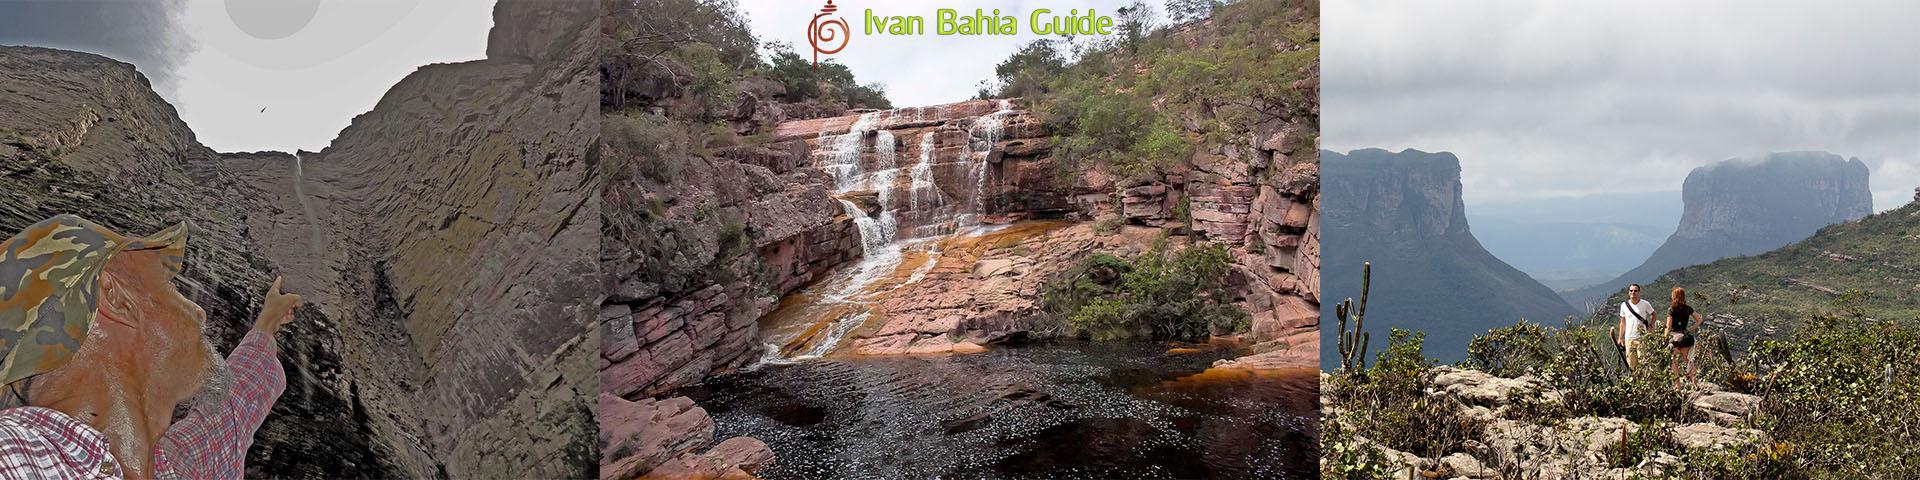 Ivan Bahia tour-guide / les meilleures ballades en  Chapada Diamantina Parc National (connu comme le 'Grand Canyon Brésilien') guide francophone vous montre les plus belles vues / #ibtg #ibg #ivanbahiaguide #ivanbahiatravelguide #zenturturismo #ivanchapadadiamantinaguide #valedopati #patyvalley #pati #viapati #valecapao #ivanchapadaguide #chapadadiamantinatransfer #chapadatrekking #chapadaroots #chapadasoul #lencoisbahia #chapadadiamantinatrekking #ivanchapadadiamantinaguide #chapadadiamantinaguide  #guidechapadadiamantina #lencois #lençois #chapadaadventuredaniel #diamondmountains #zentur # #guiachapadadiamantina #chapadaaventure #discoverchapada #chapadadiamond #chapadasoul #diamantinatrip  #tripadvisor #bahiametisse, #fernandobingre, #ivansalvadorbahia #salvadorbahiaTravel #toursbylocals #fotosbahia #bahiafotos #chapadadiamantinanationalpark #yourtoursbrazil #maurotours #bahiatopturismo #bahiapremium #maisbahiaturismo #fernandobingretourguide #cassiturismo